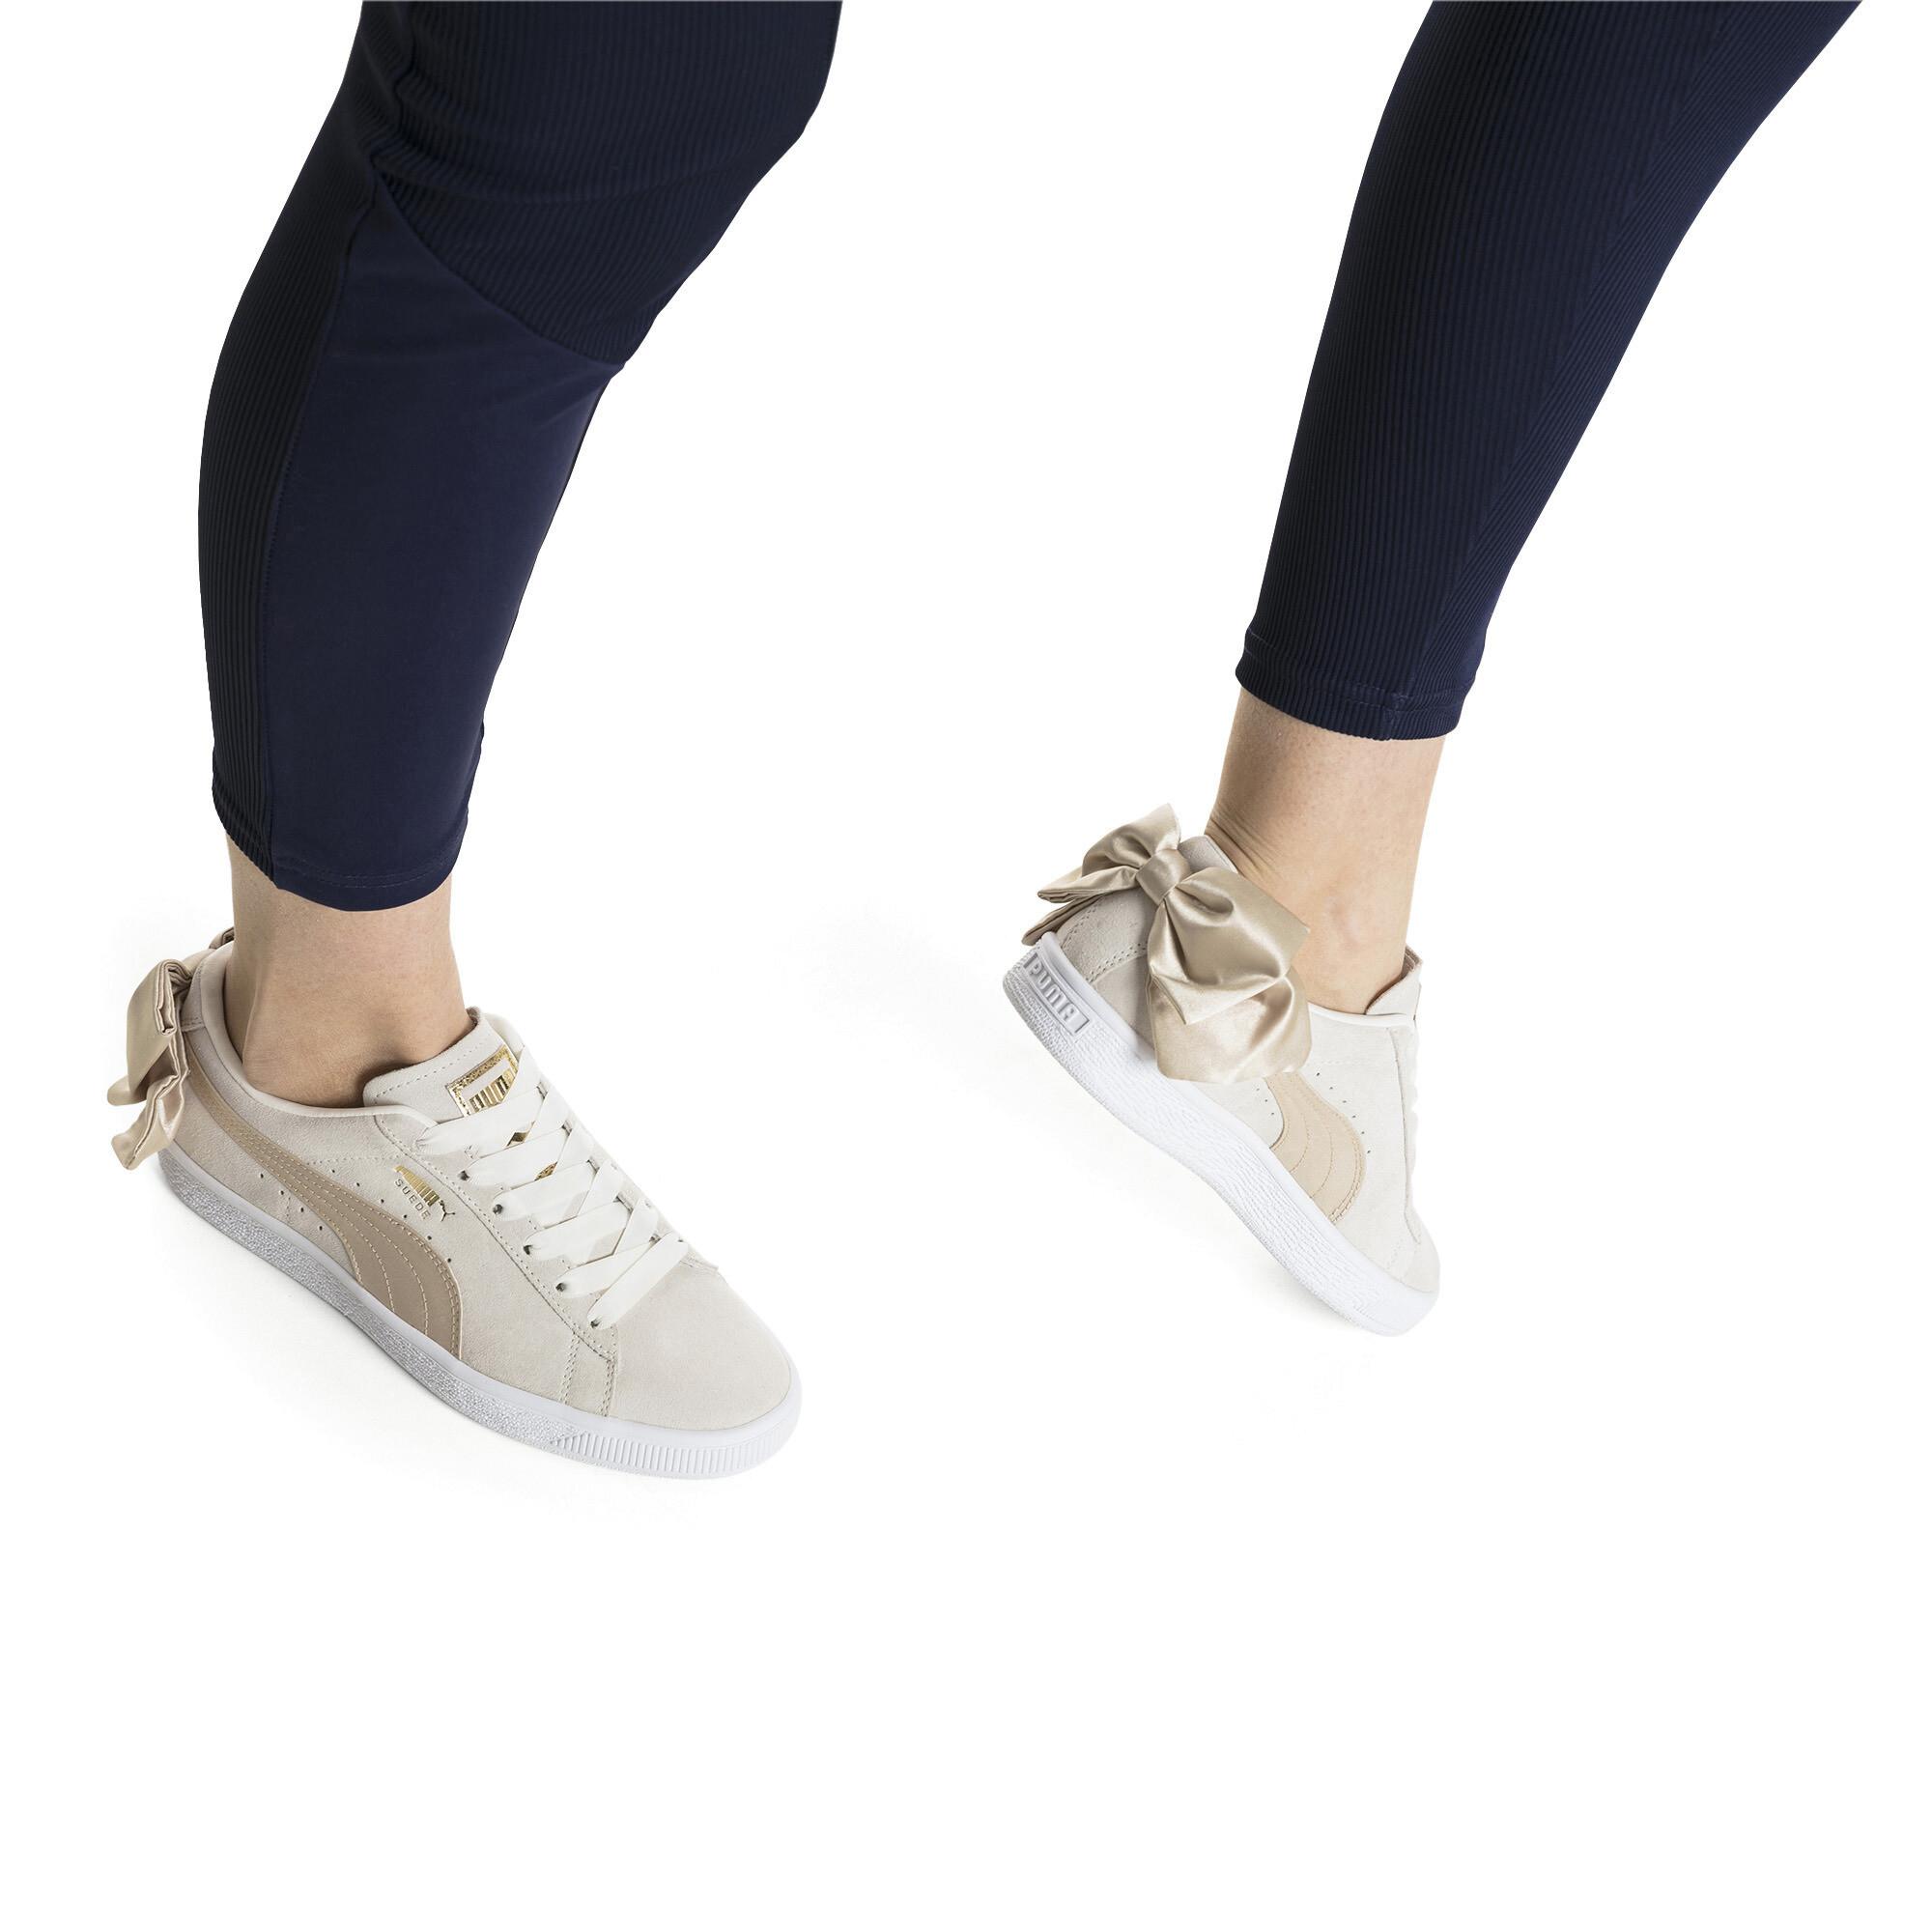 Details zu PUMA Suede Bow Varsity Damen Sneaker Frauen Schuhe Sport Classics Neu